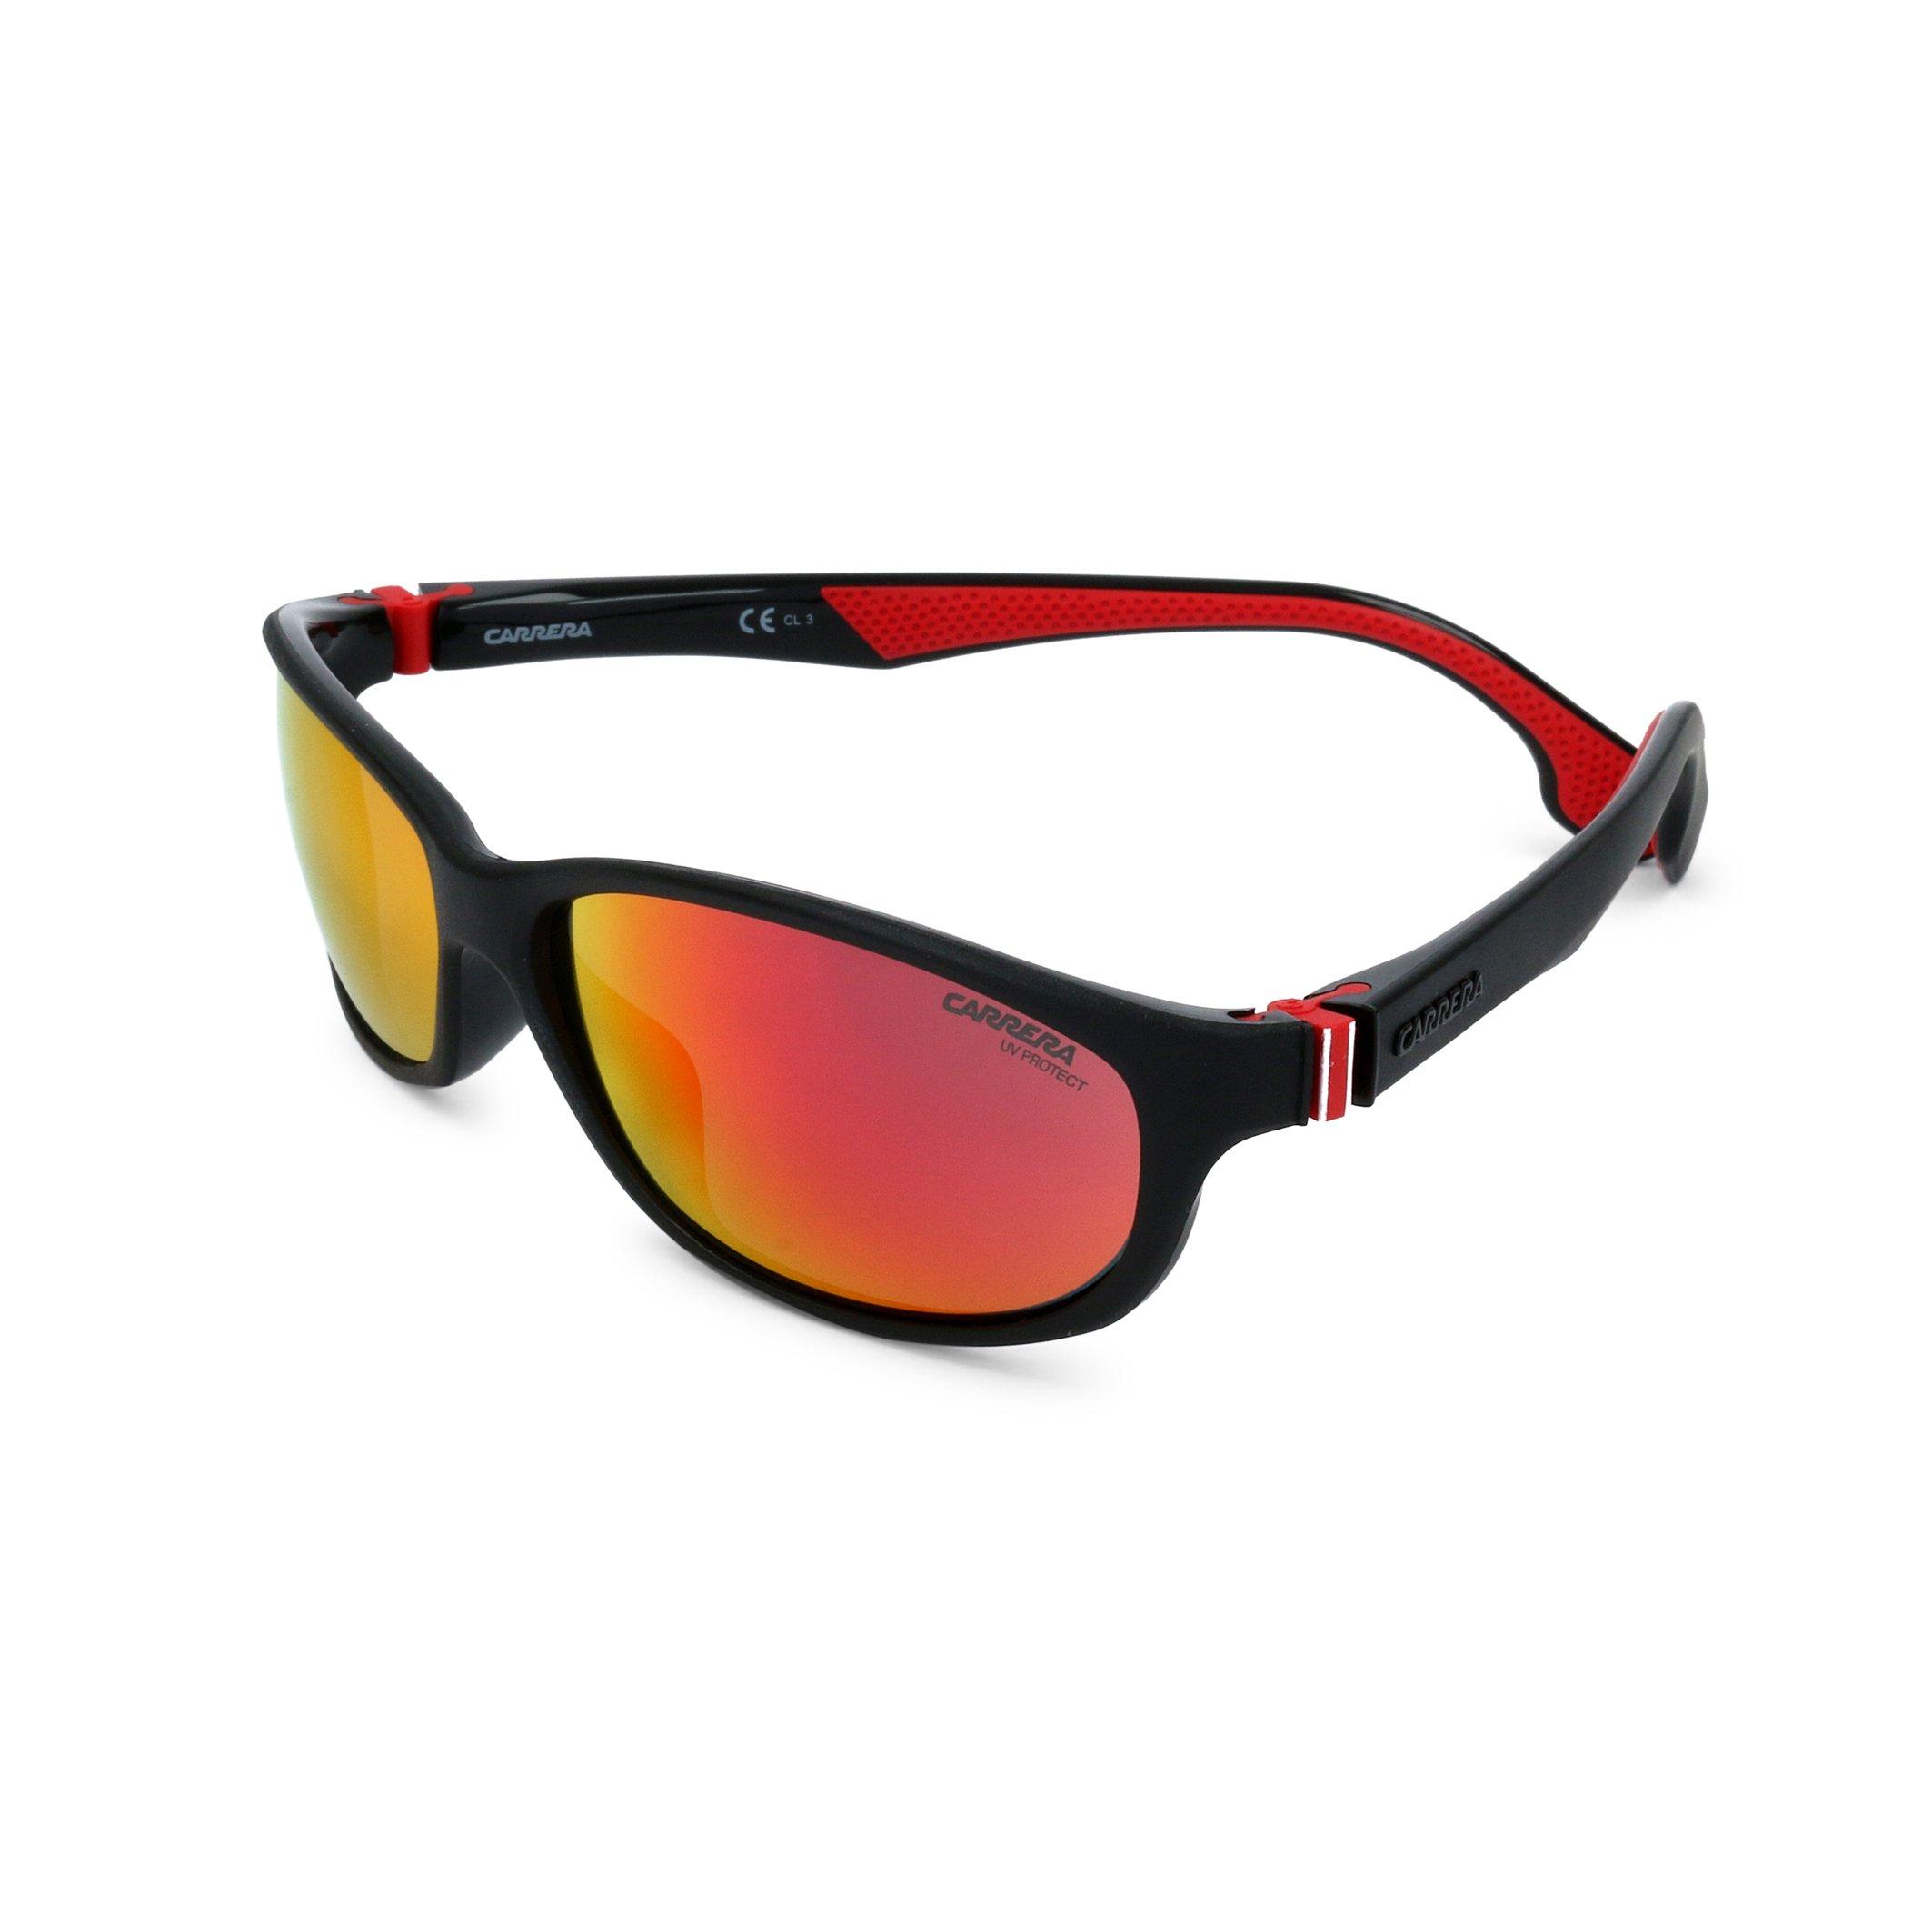 Carrera Men's Sunglasses Various Colours CARRERA5052S - black-1 NOSIZE